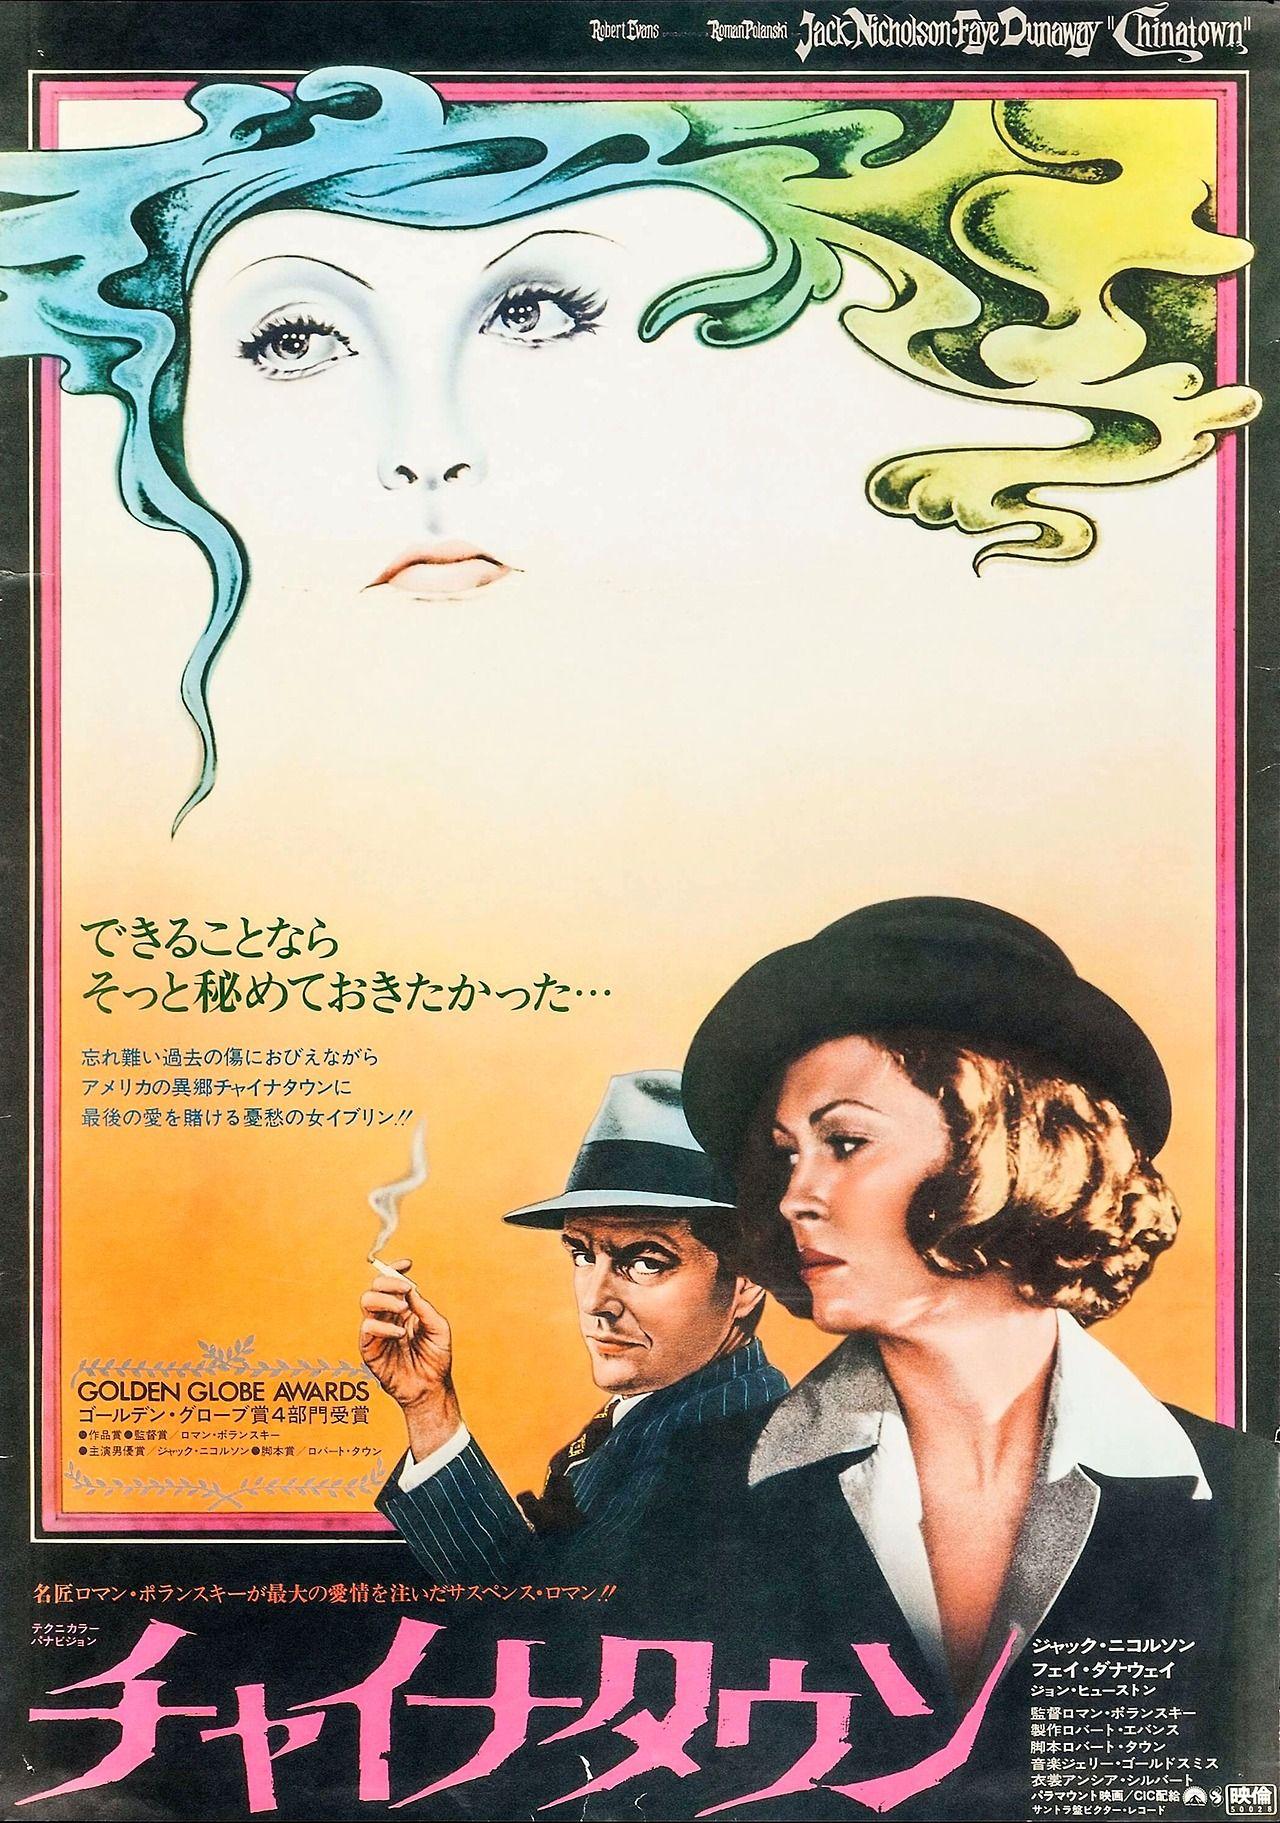 Chinatown 1974 roman polanski japanese movie poster